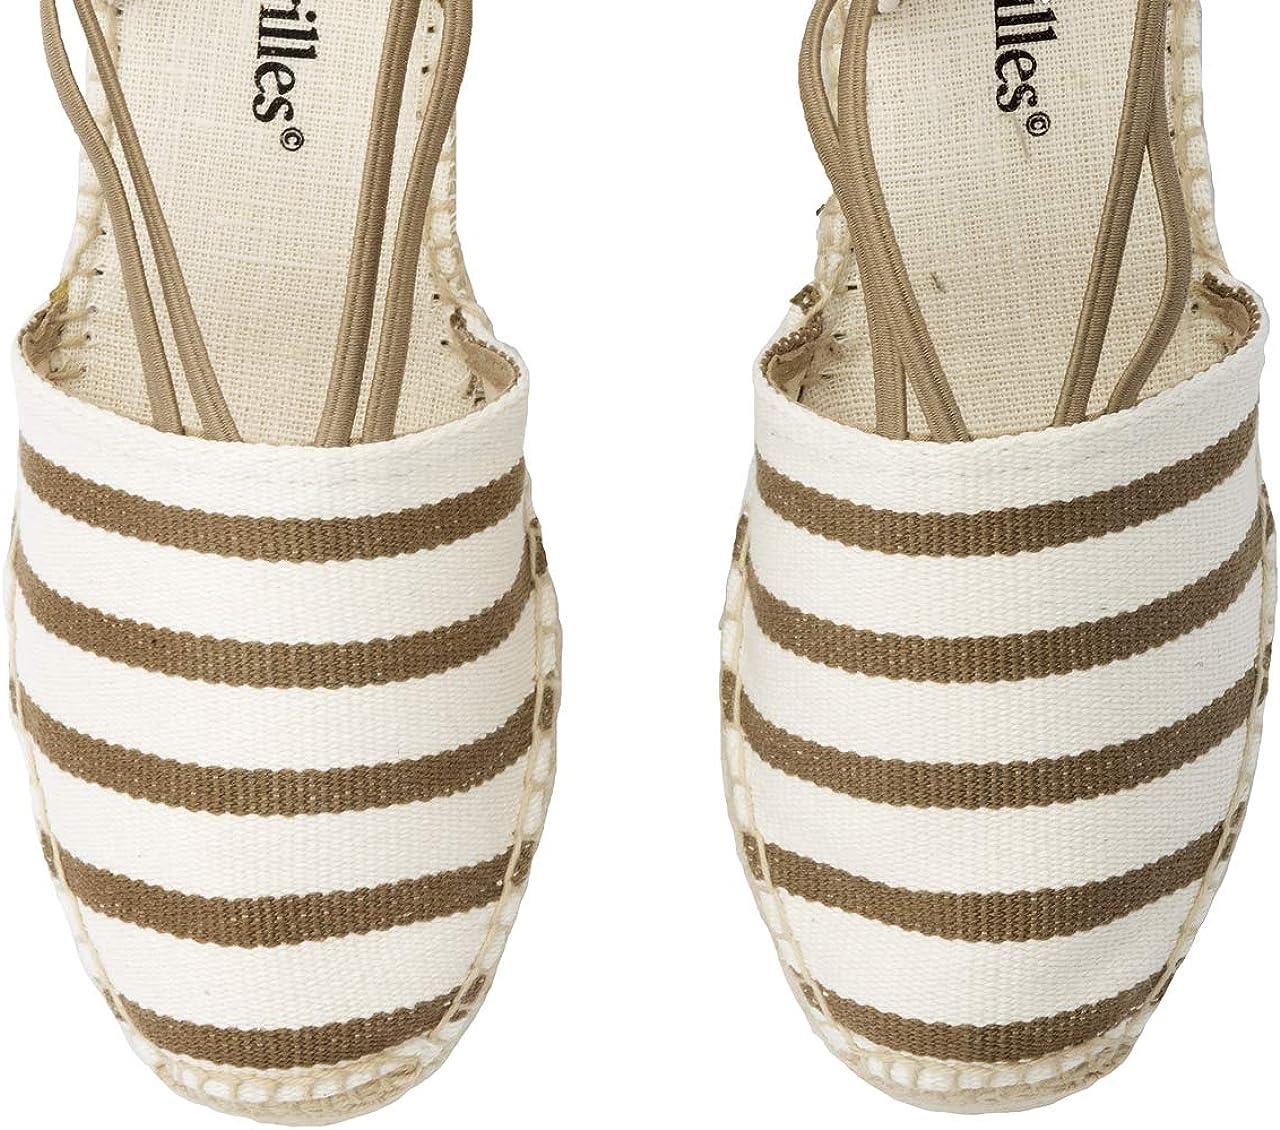 2 Espadrilles Alpargatas Sandalias Mujer Fabricadas a Mano en Espa/ña Espadrilles Esparto Zapato para Mujer Tac/ón Marina